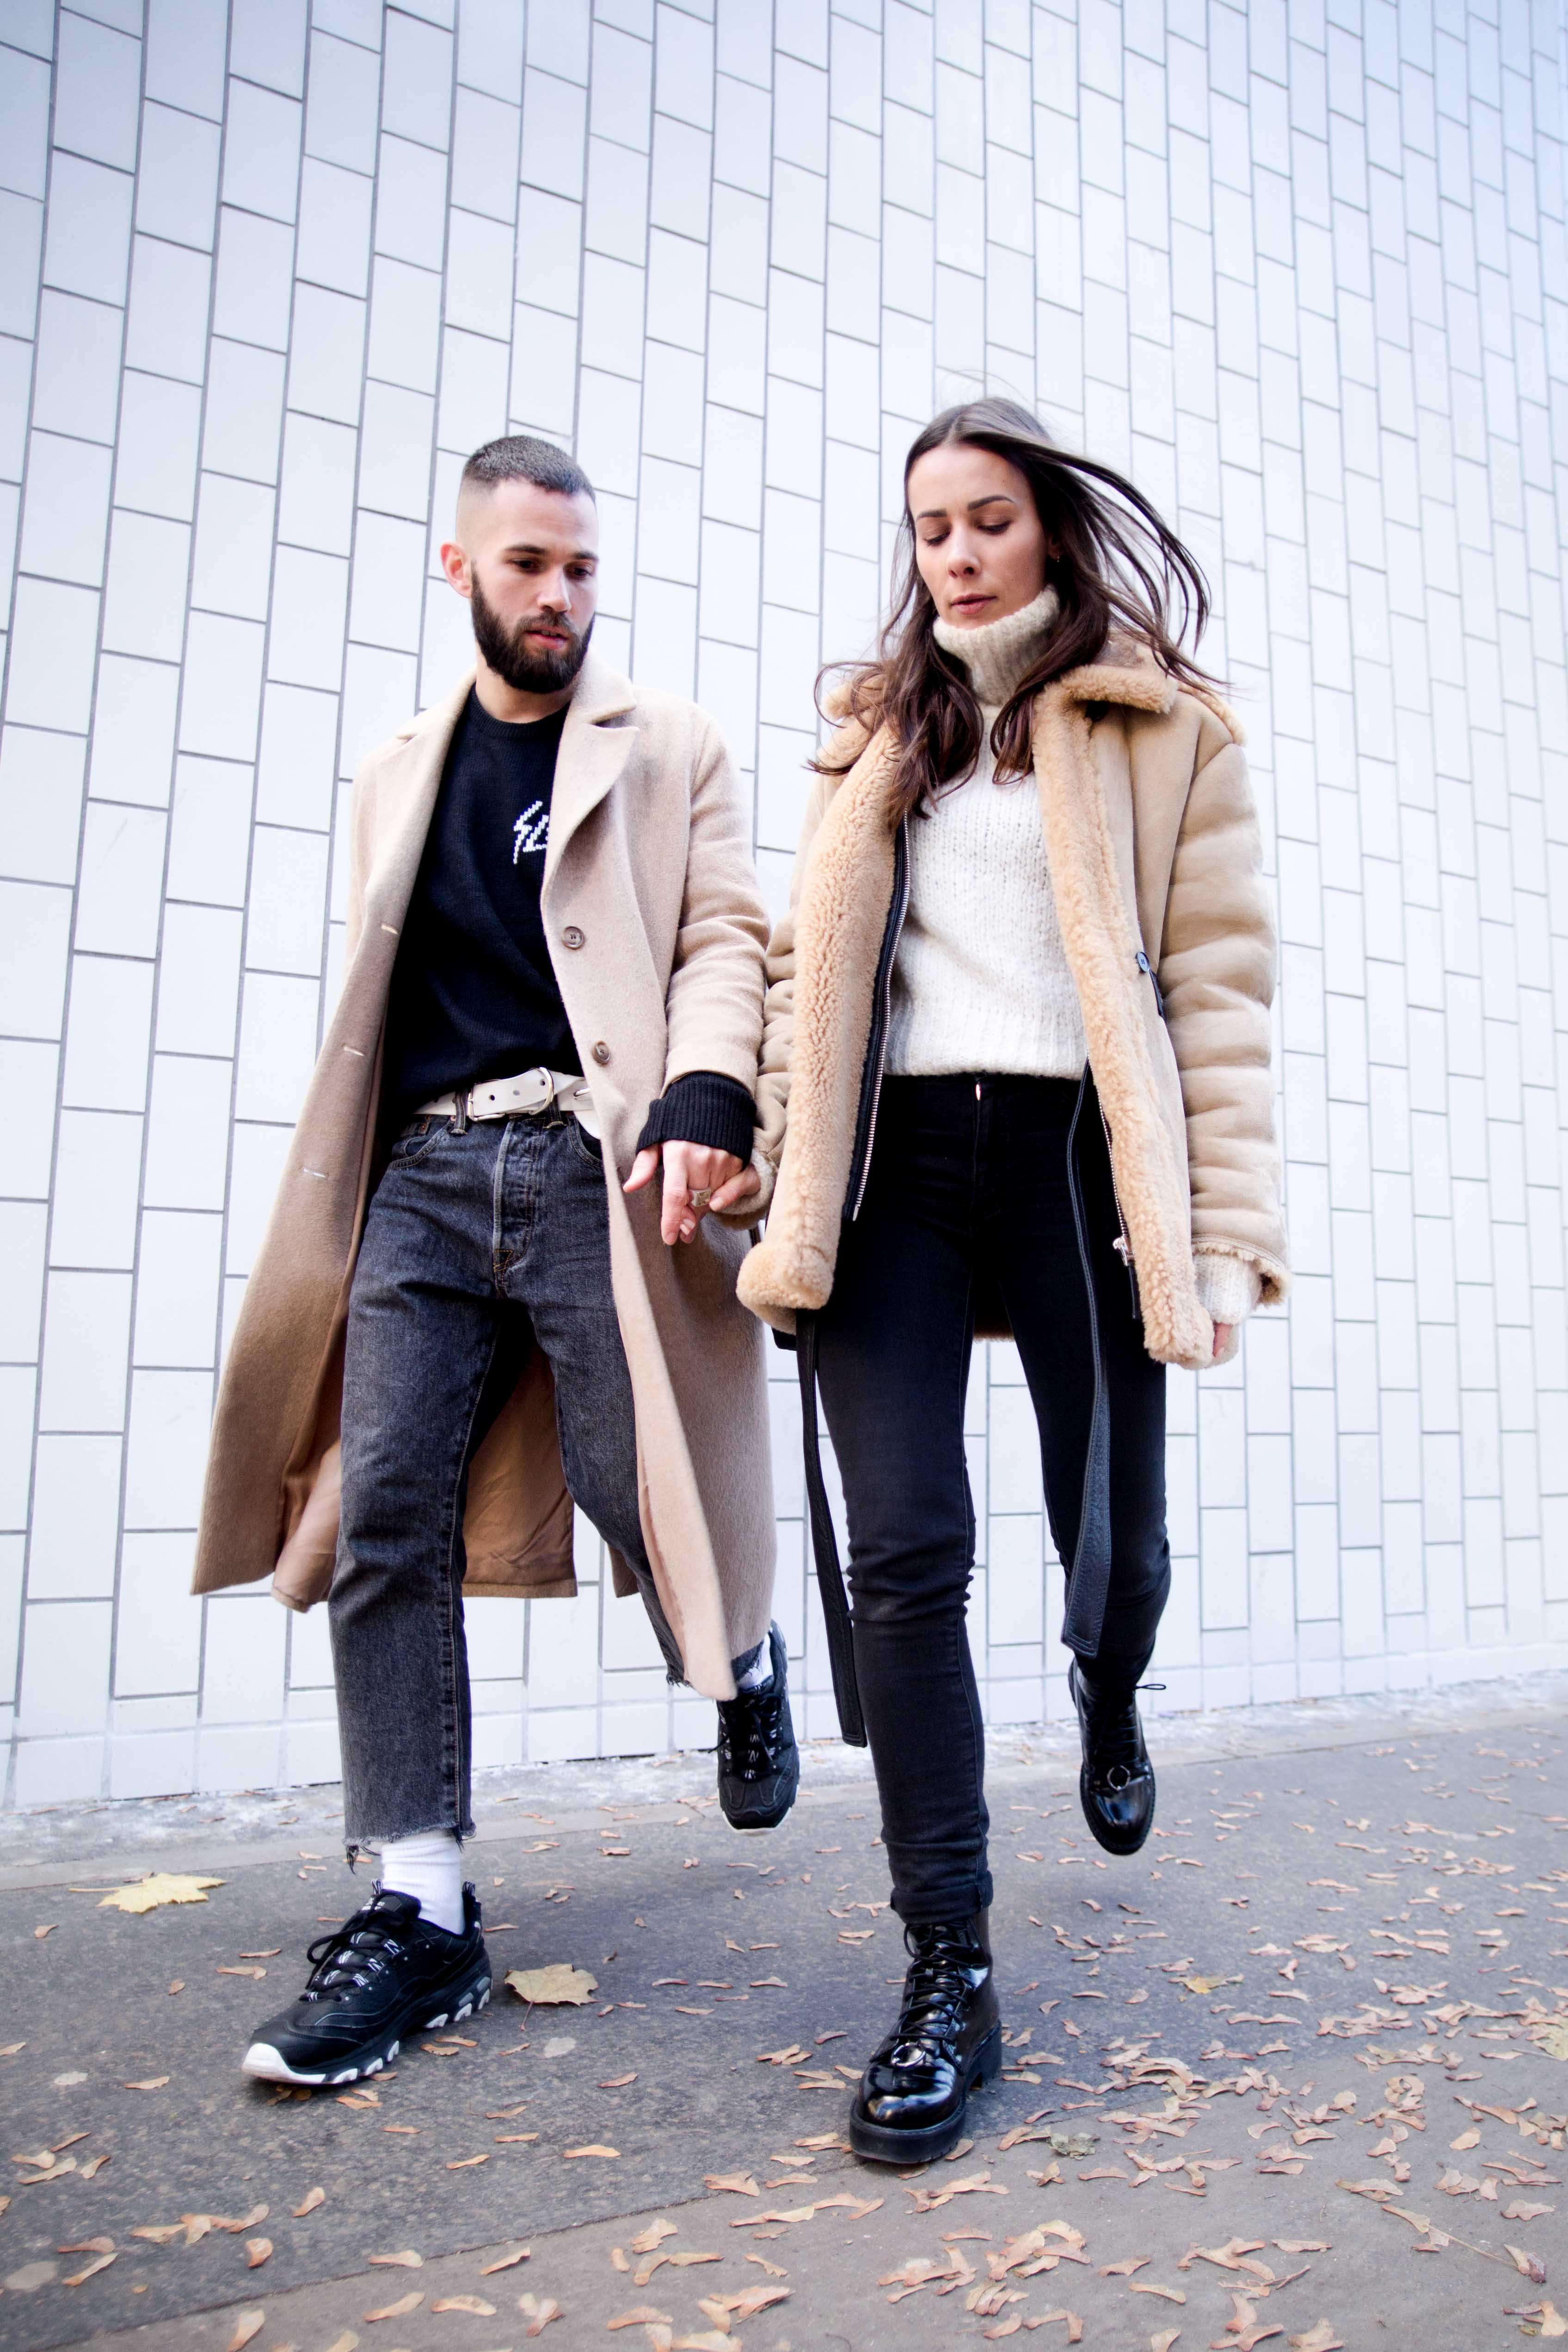 fashion-french-couple-blog-mode-couple-jaimetoutcheztoi-alice-et-js-46